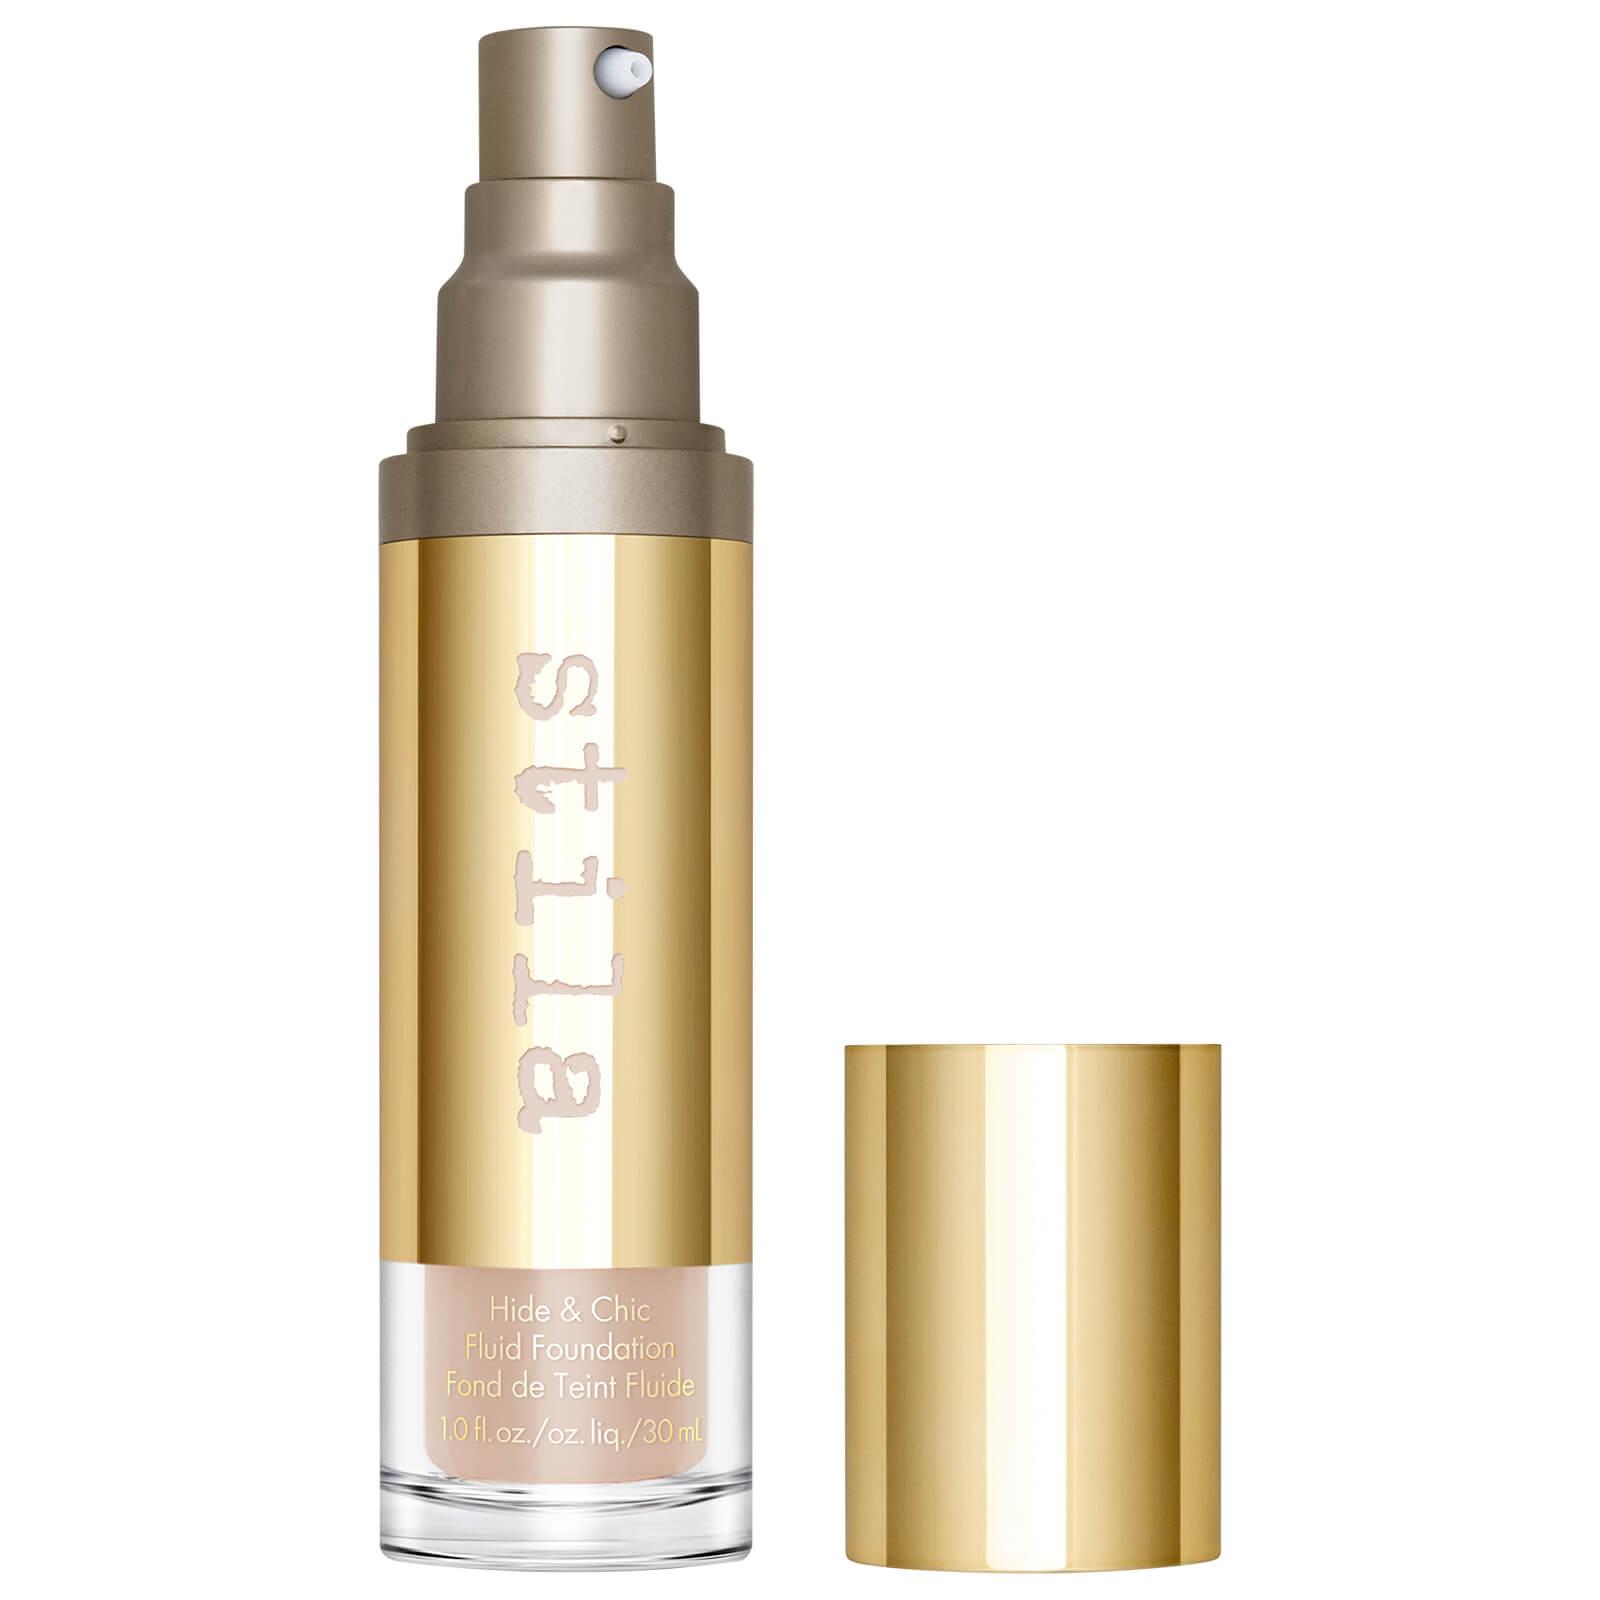 Купить Stila Hide and Chic Fluid Foundation 30ml (Various Shades) - Medium 1